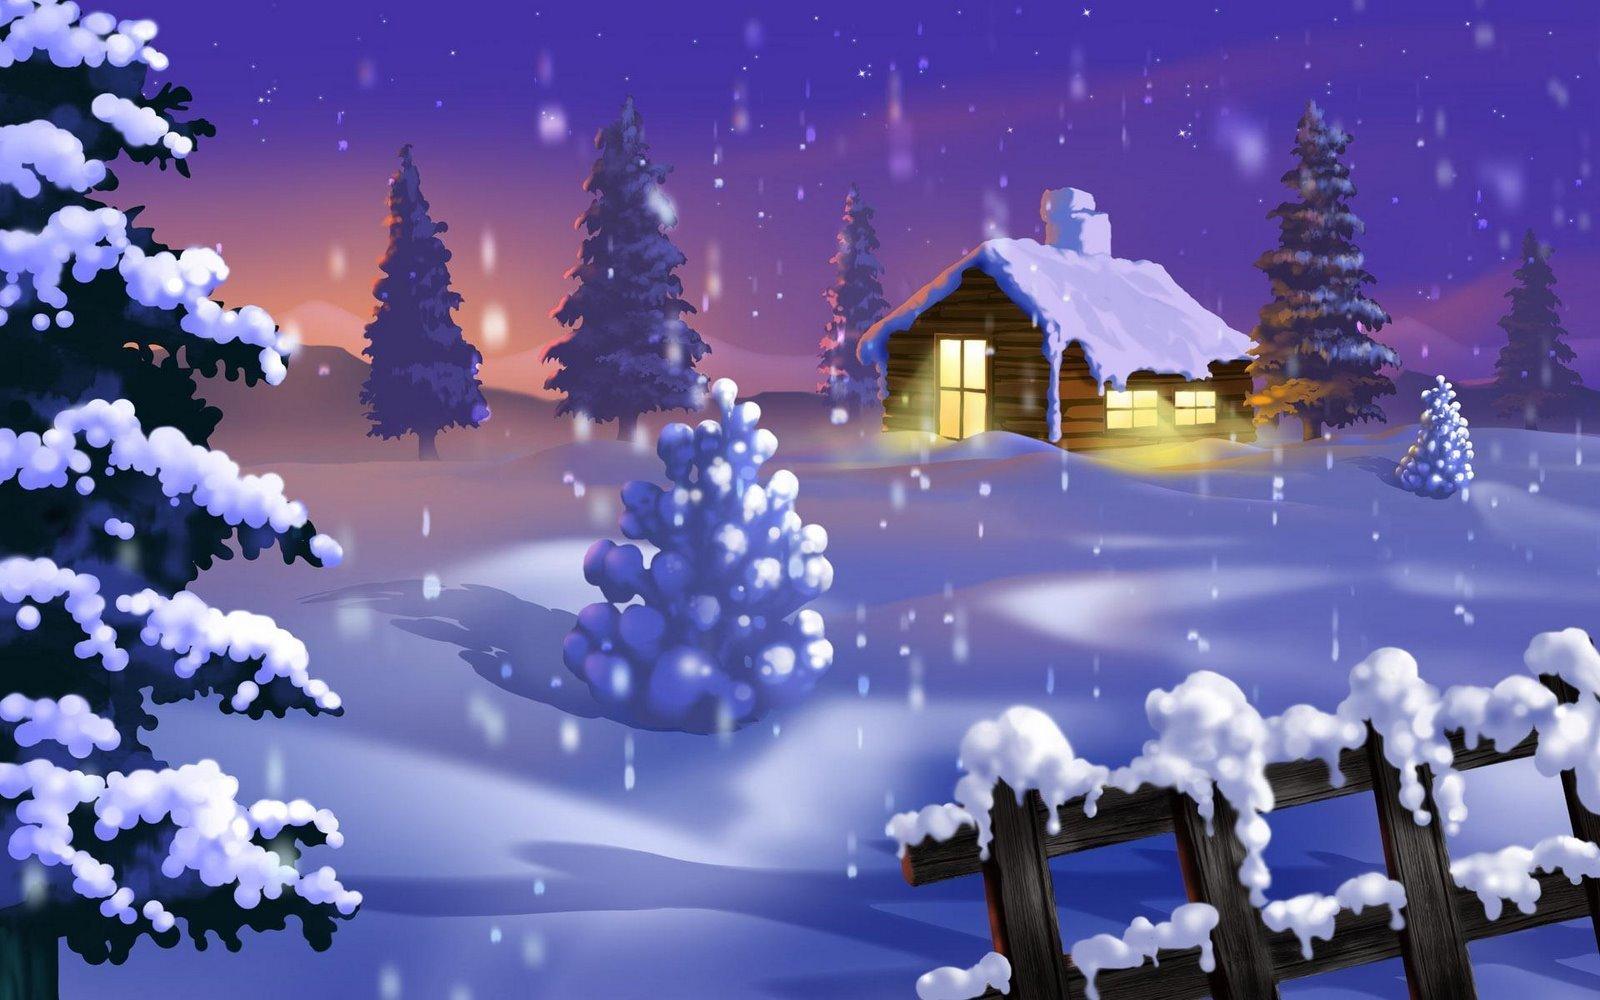 78] Christmas Wallpapers Desktop on WallpaperSafari 1600x1000